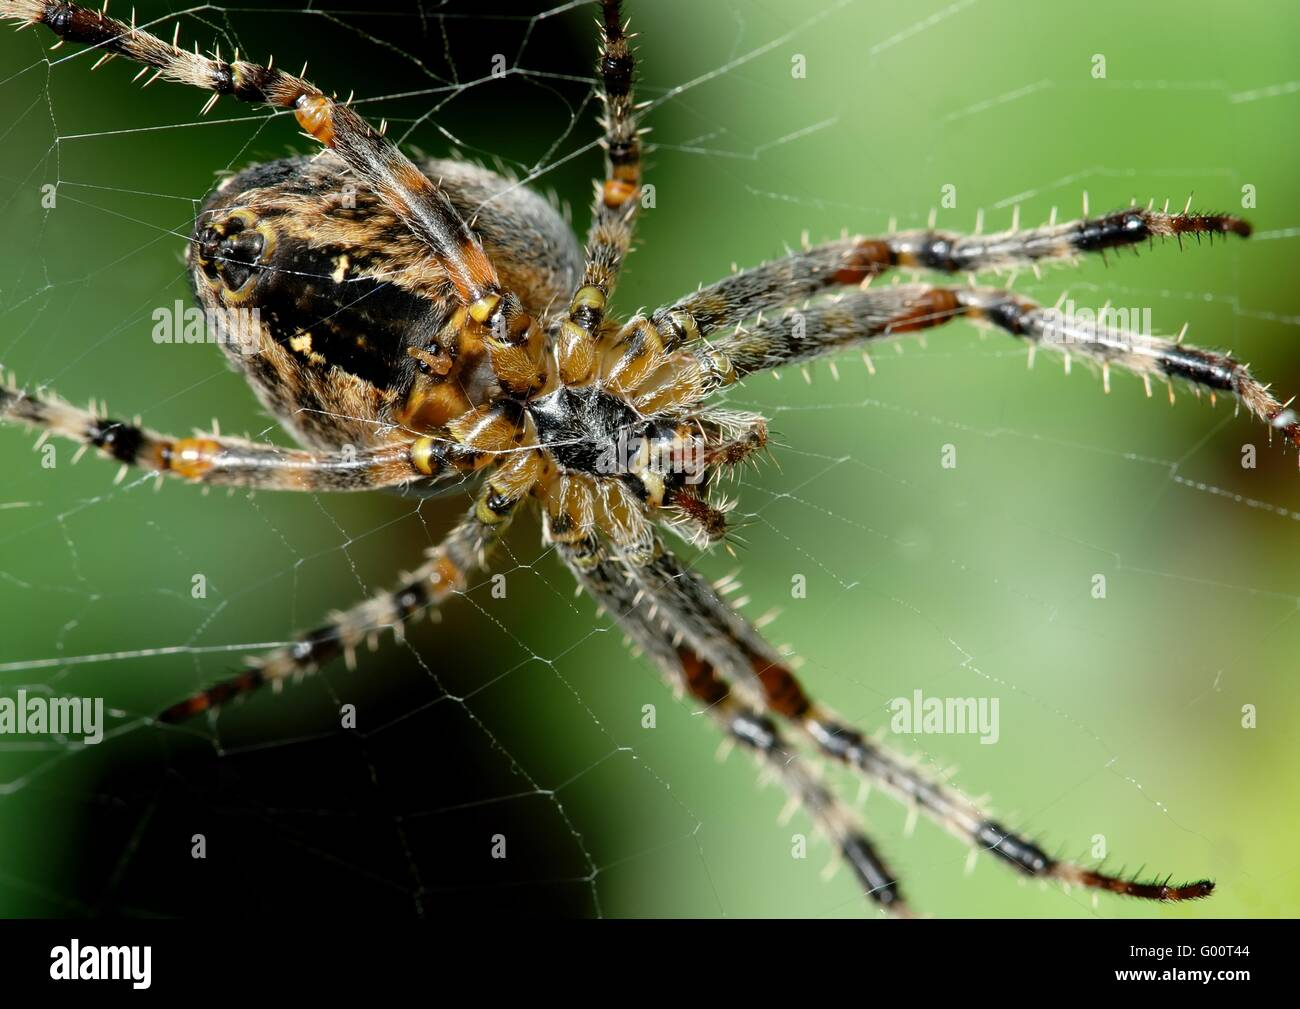 Araneus diadematus - Stock Image